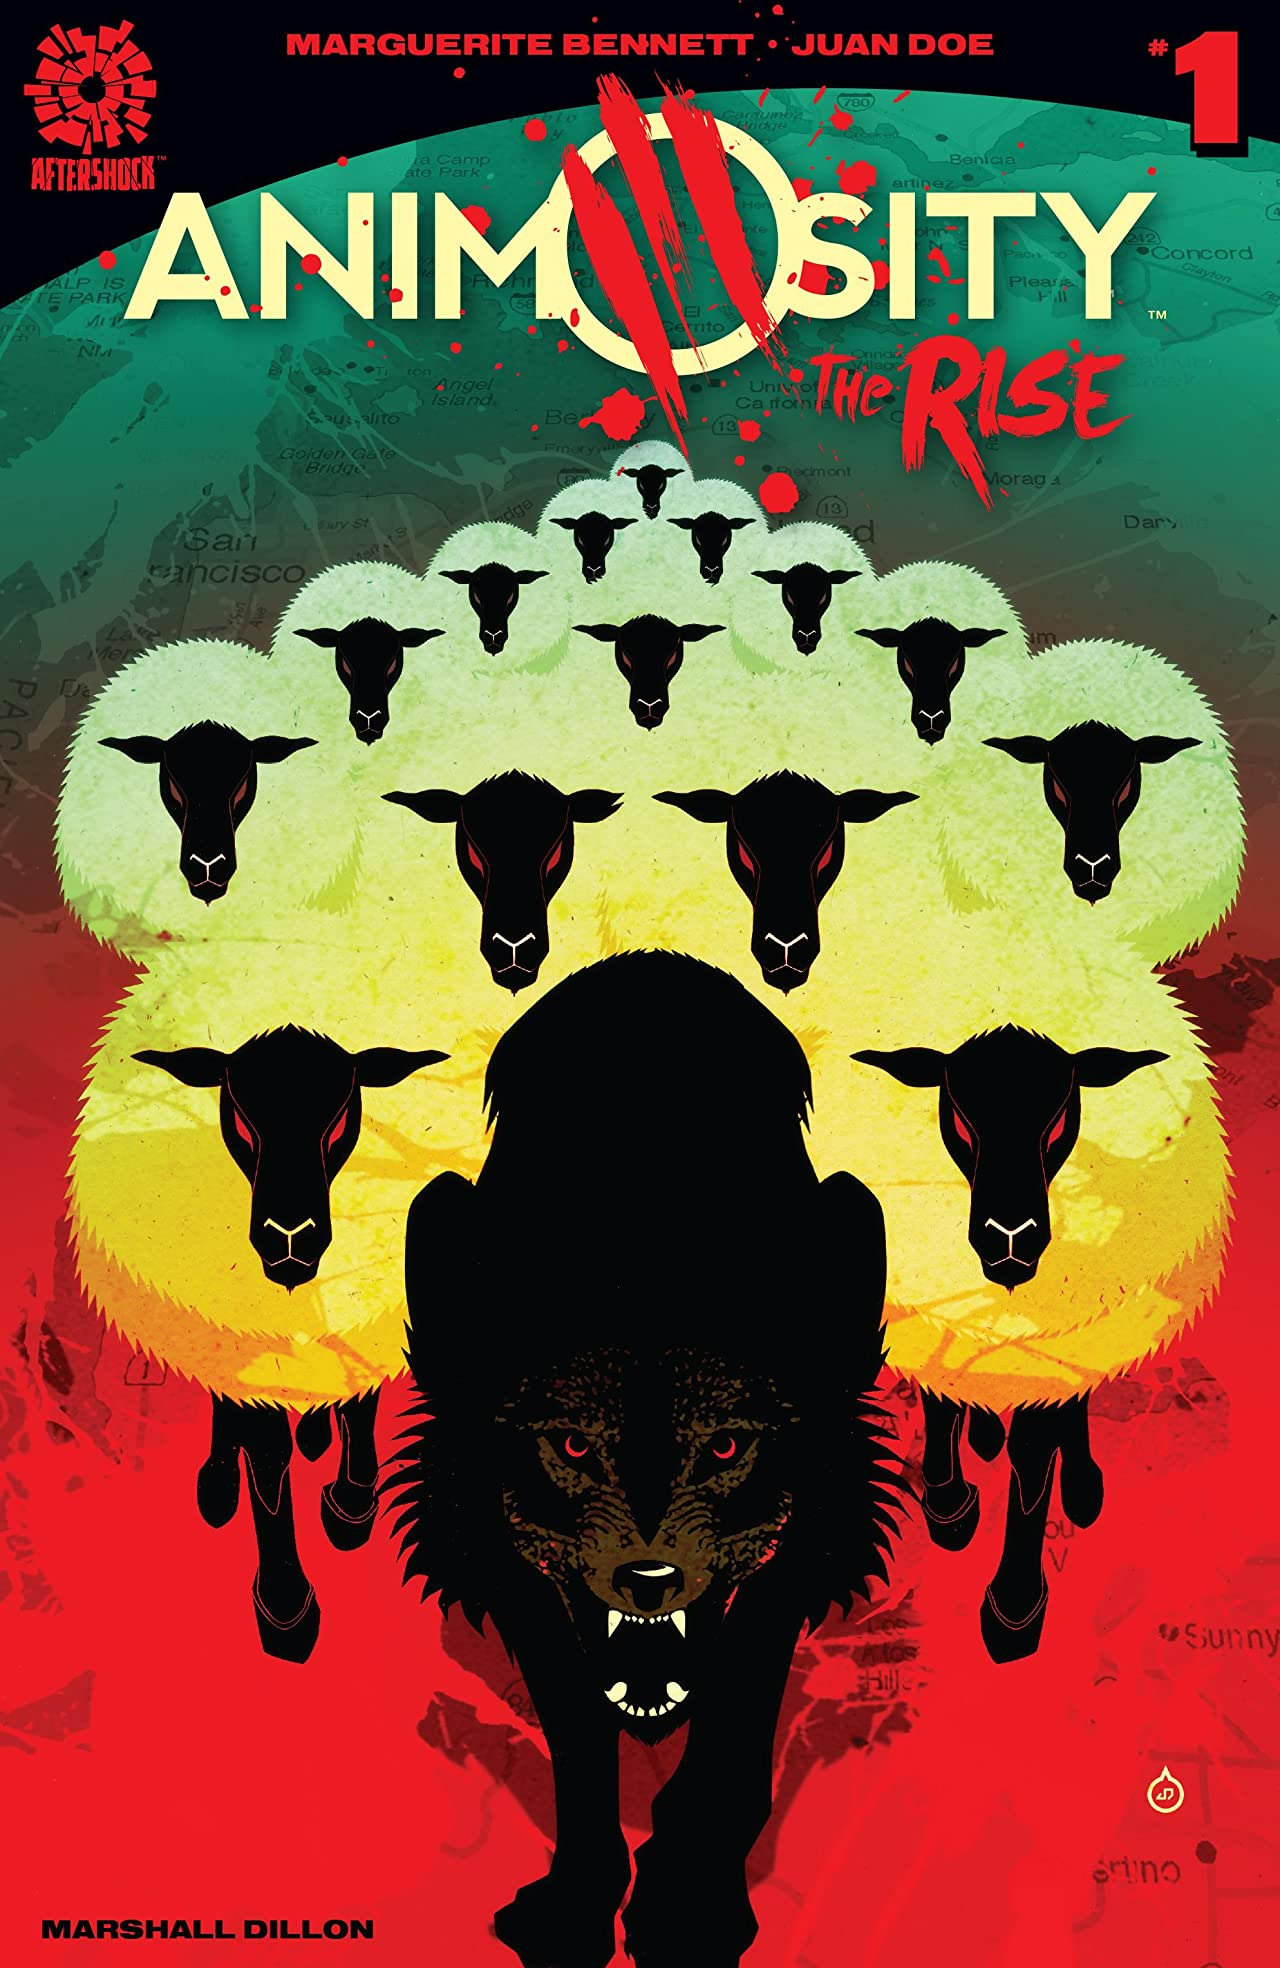 Animosity: The Rise